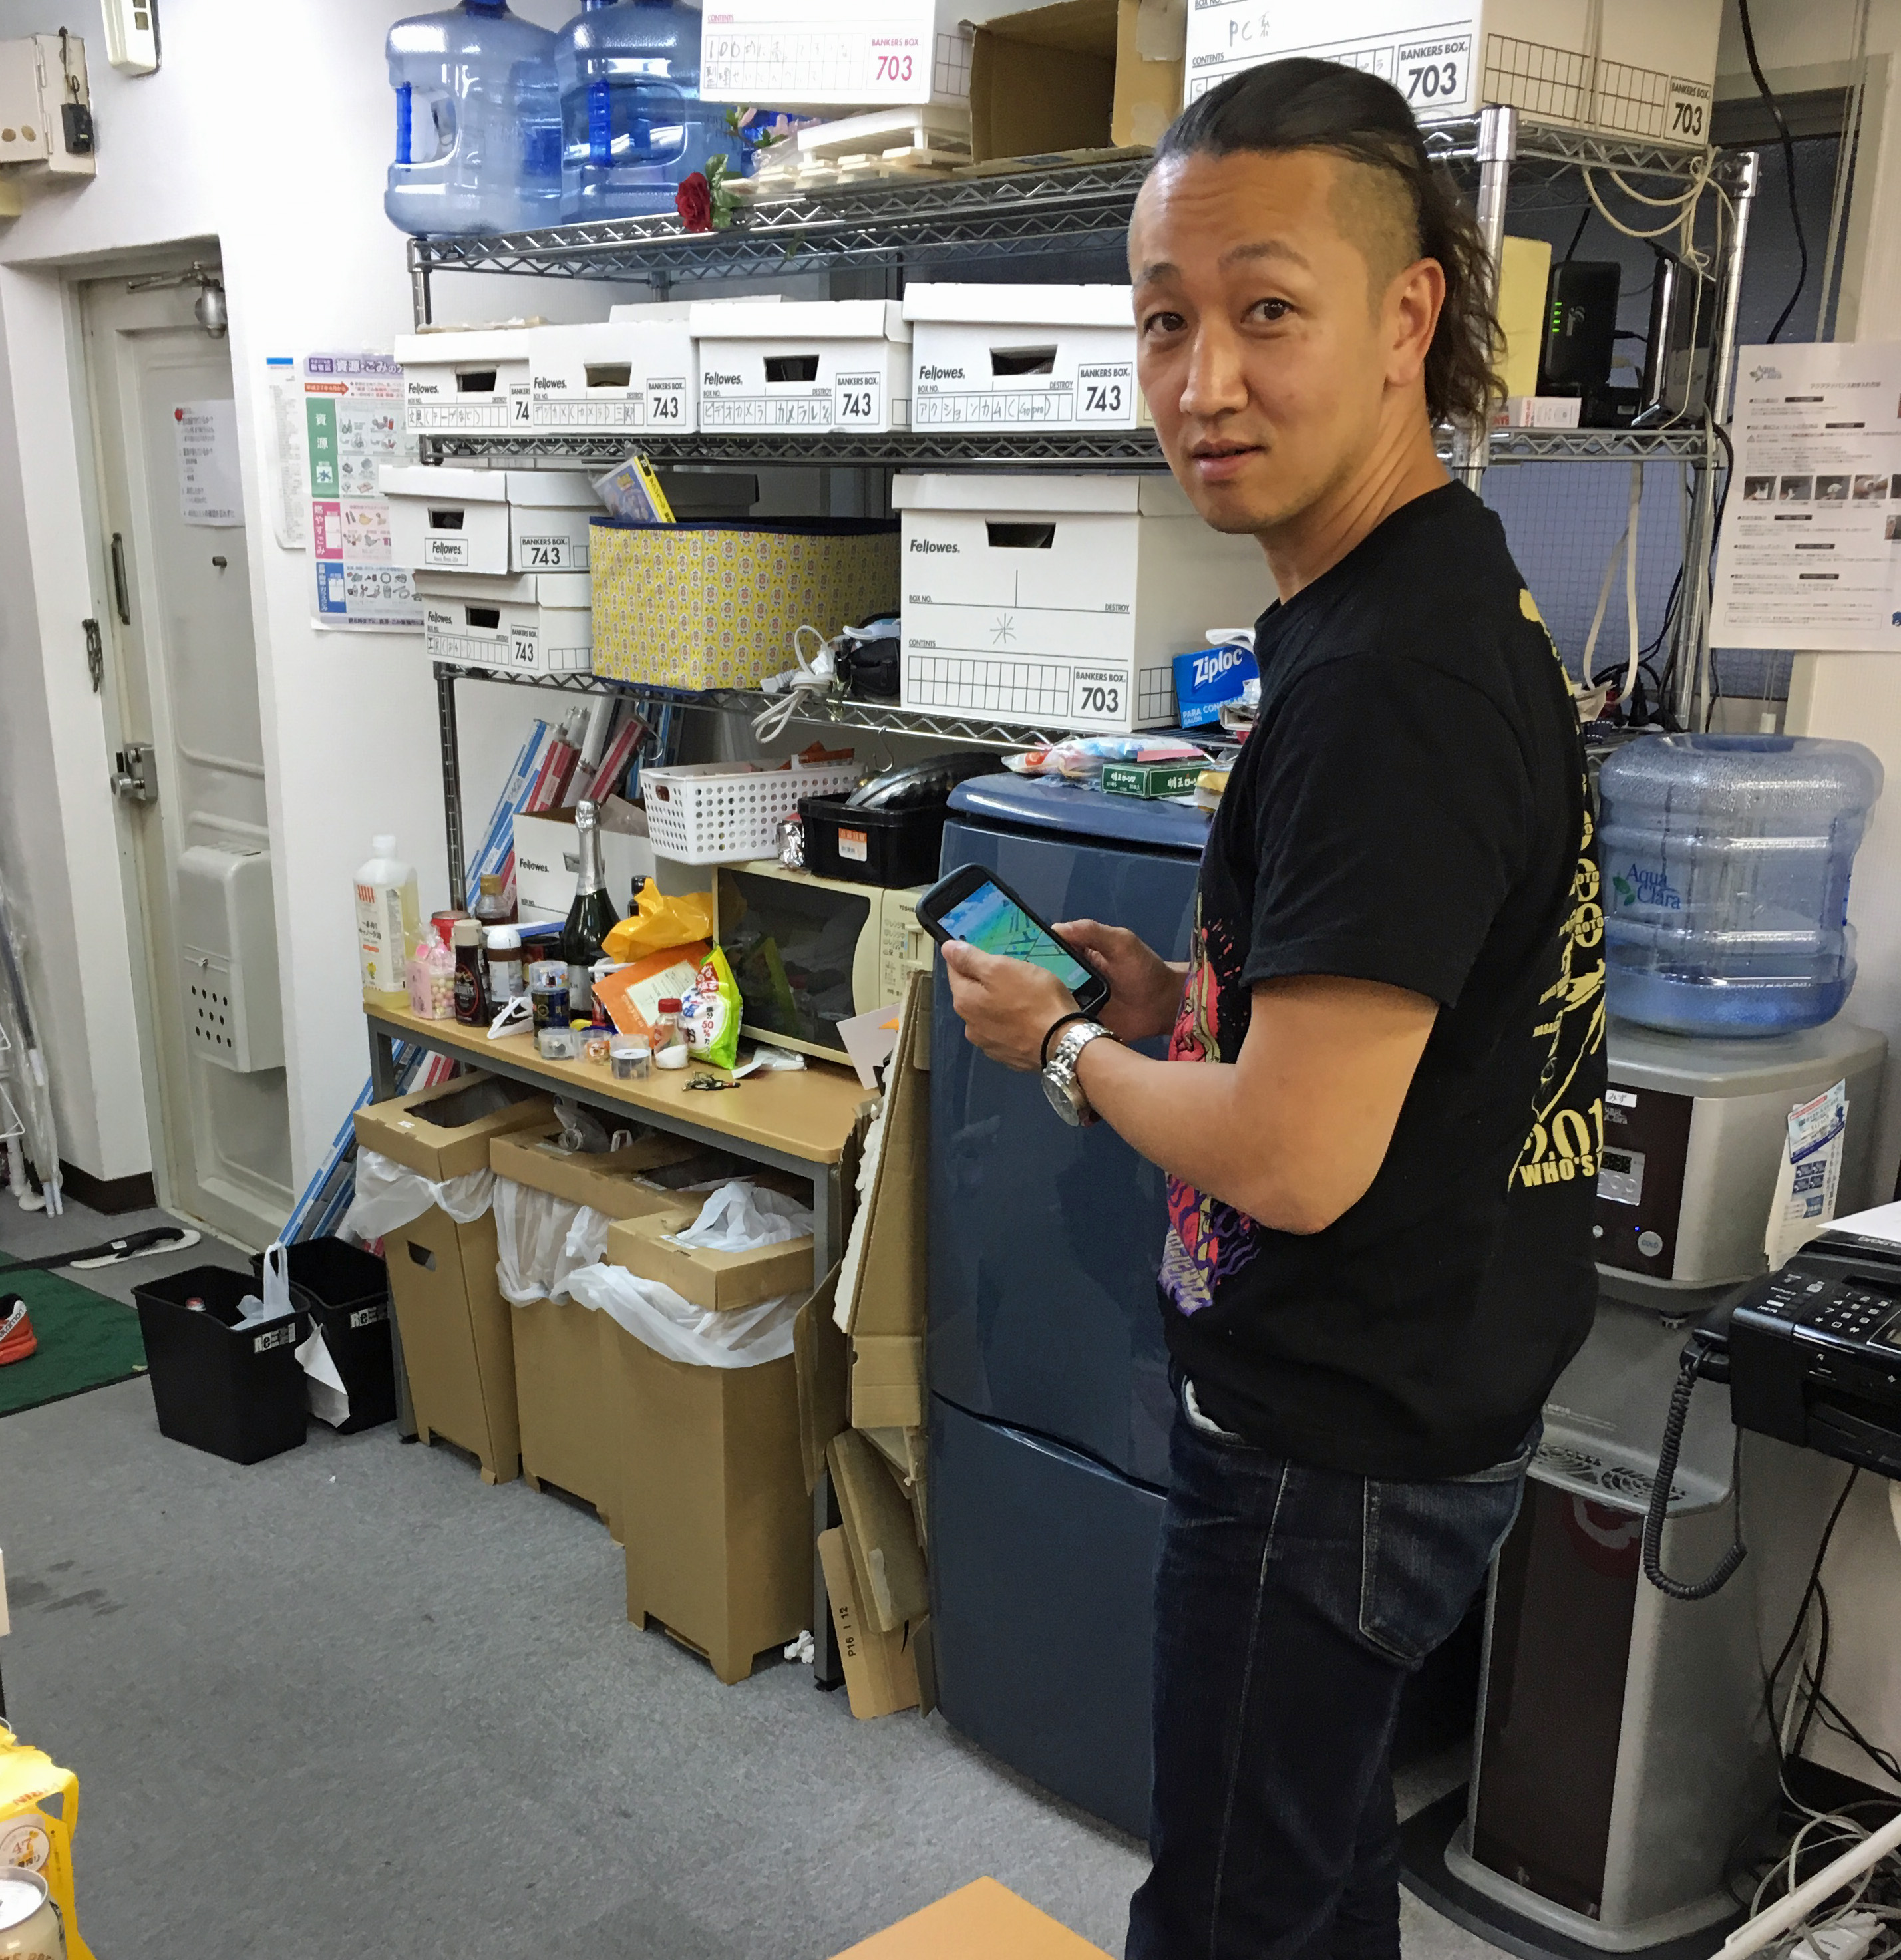 jpokemon3